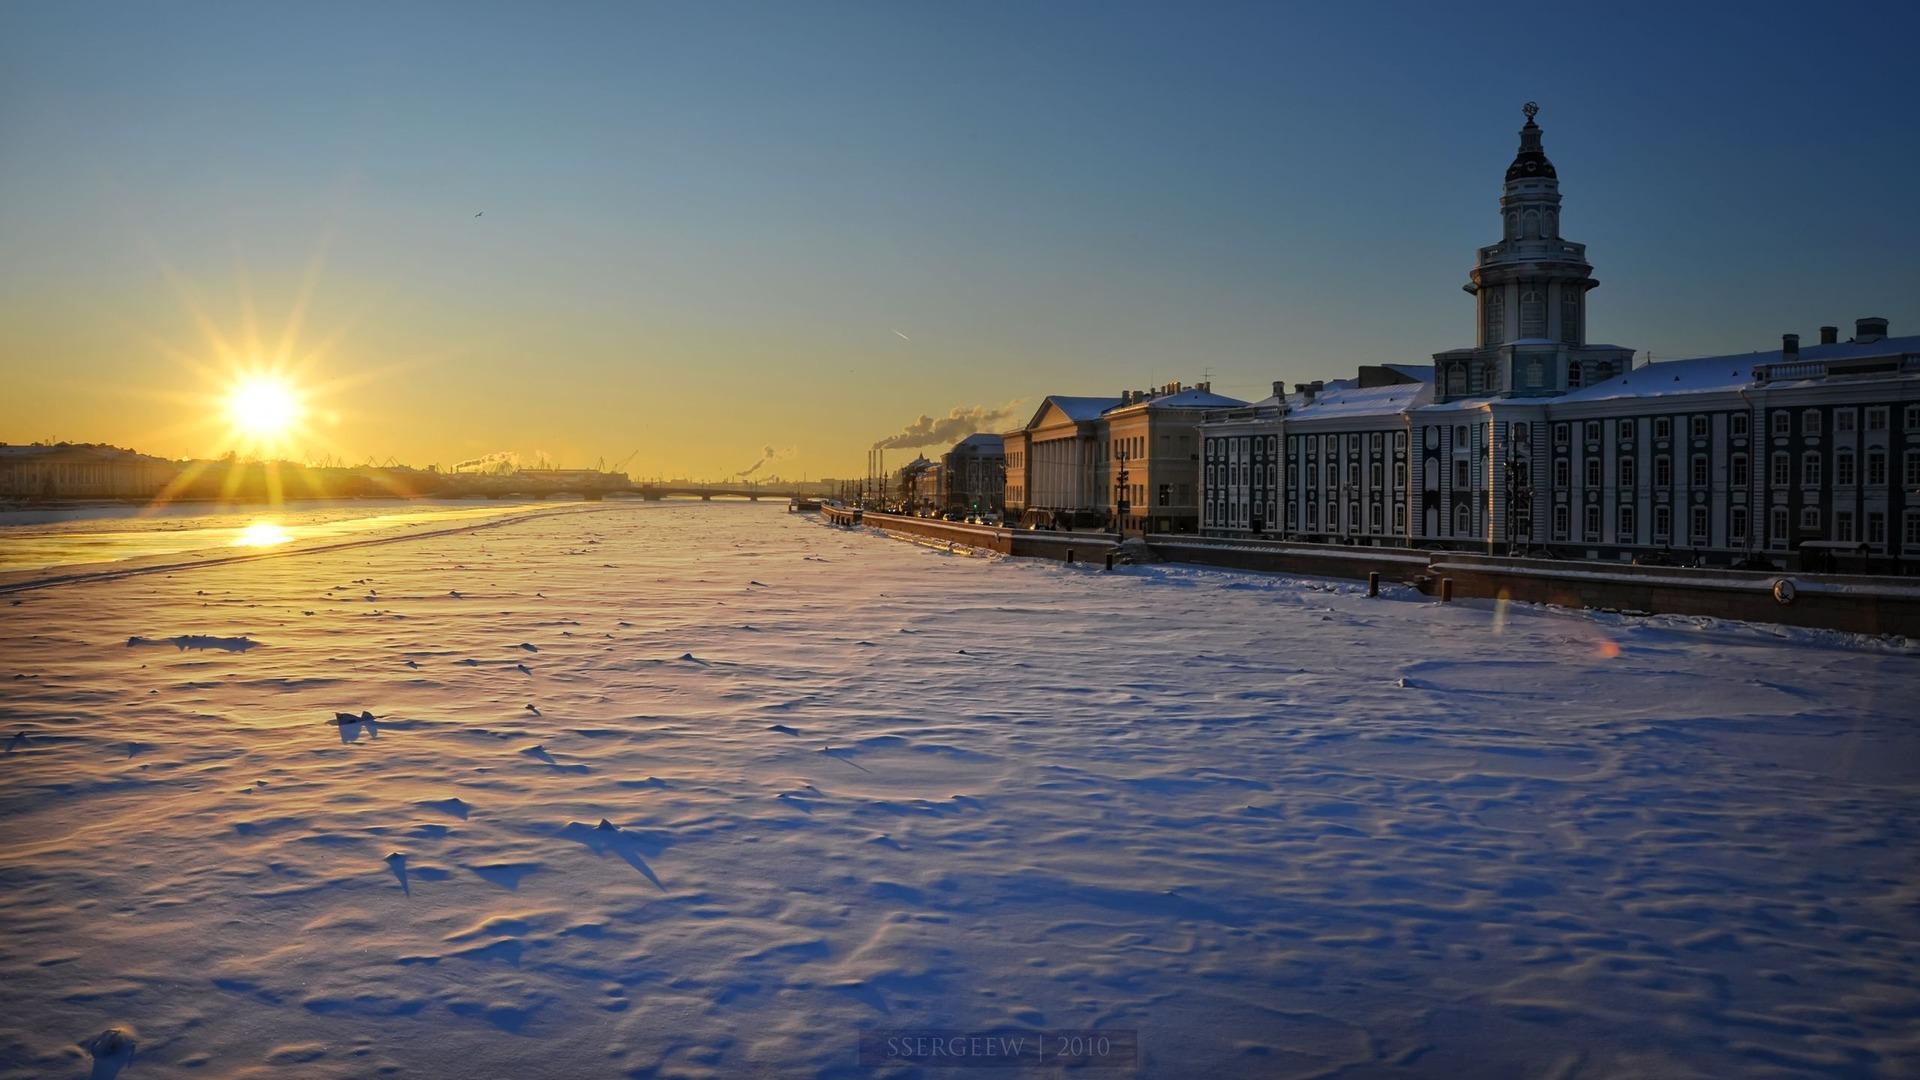 Санкт петербург обои для раб стола